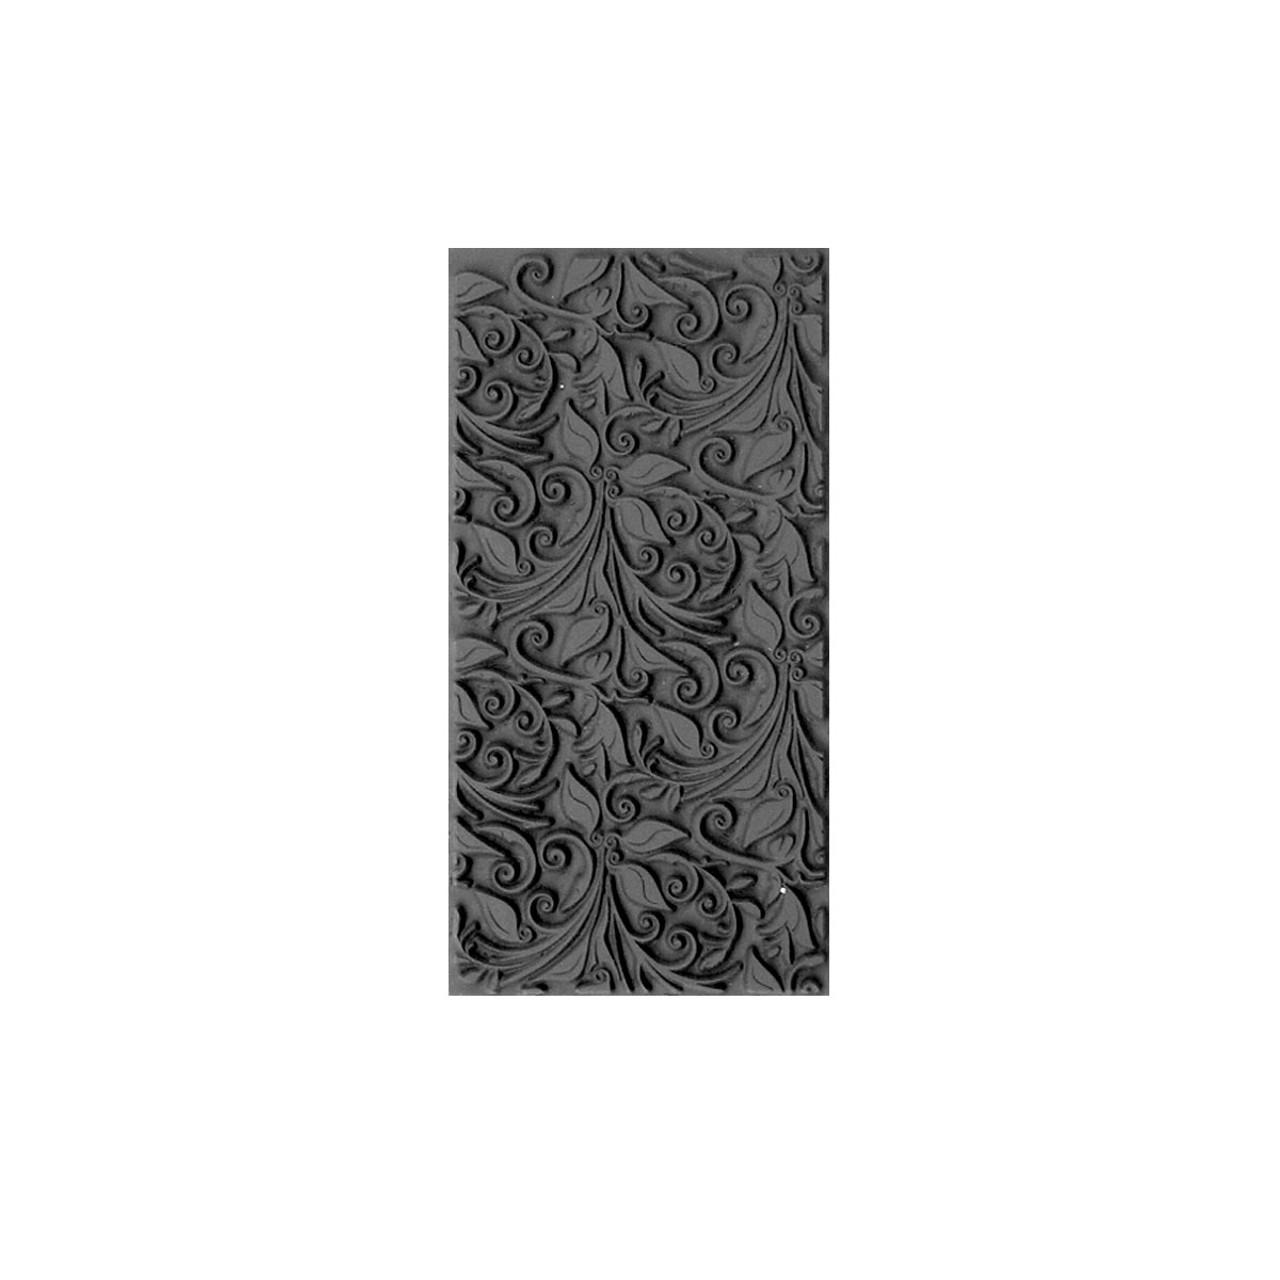 Texture Tile - Leaves & Tendrils